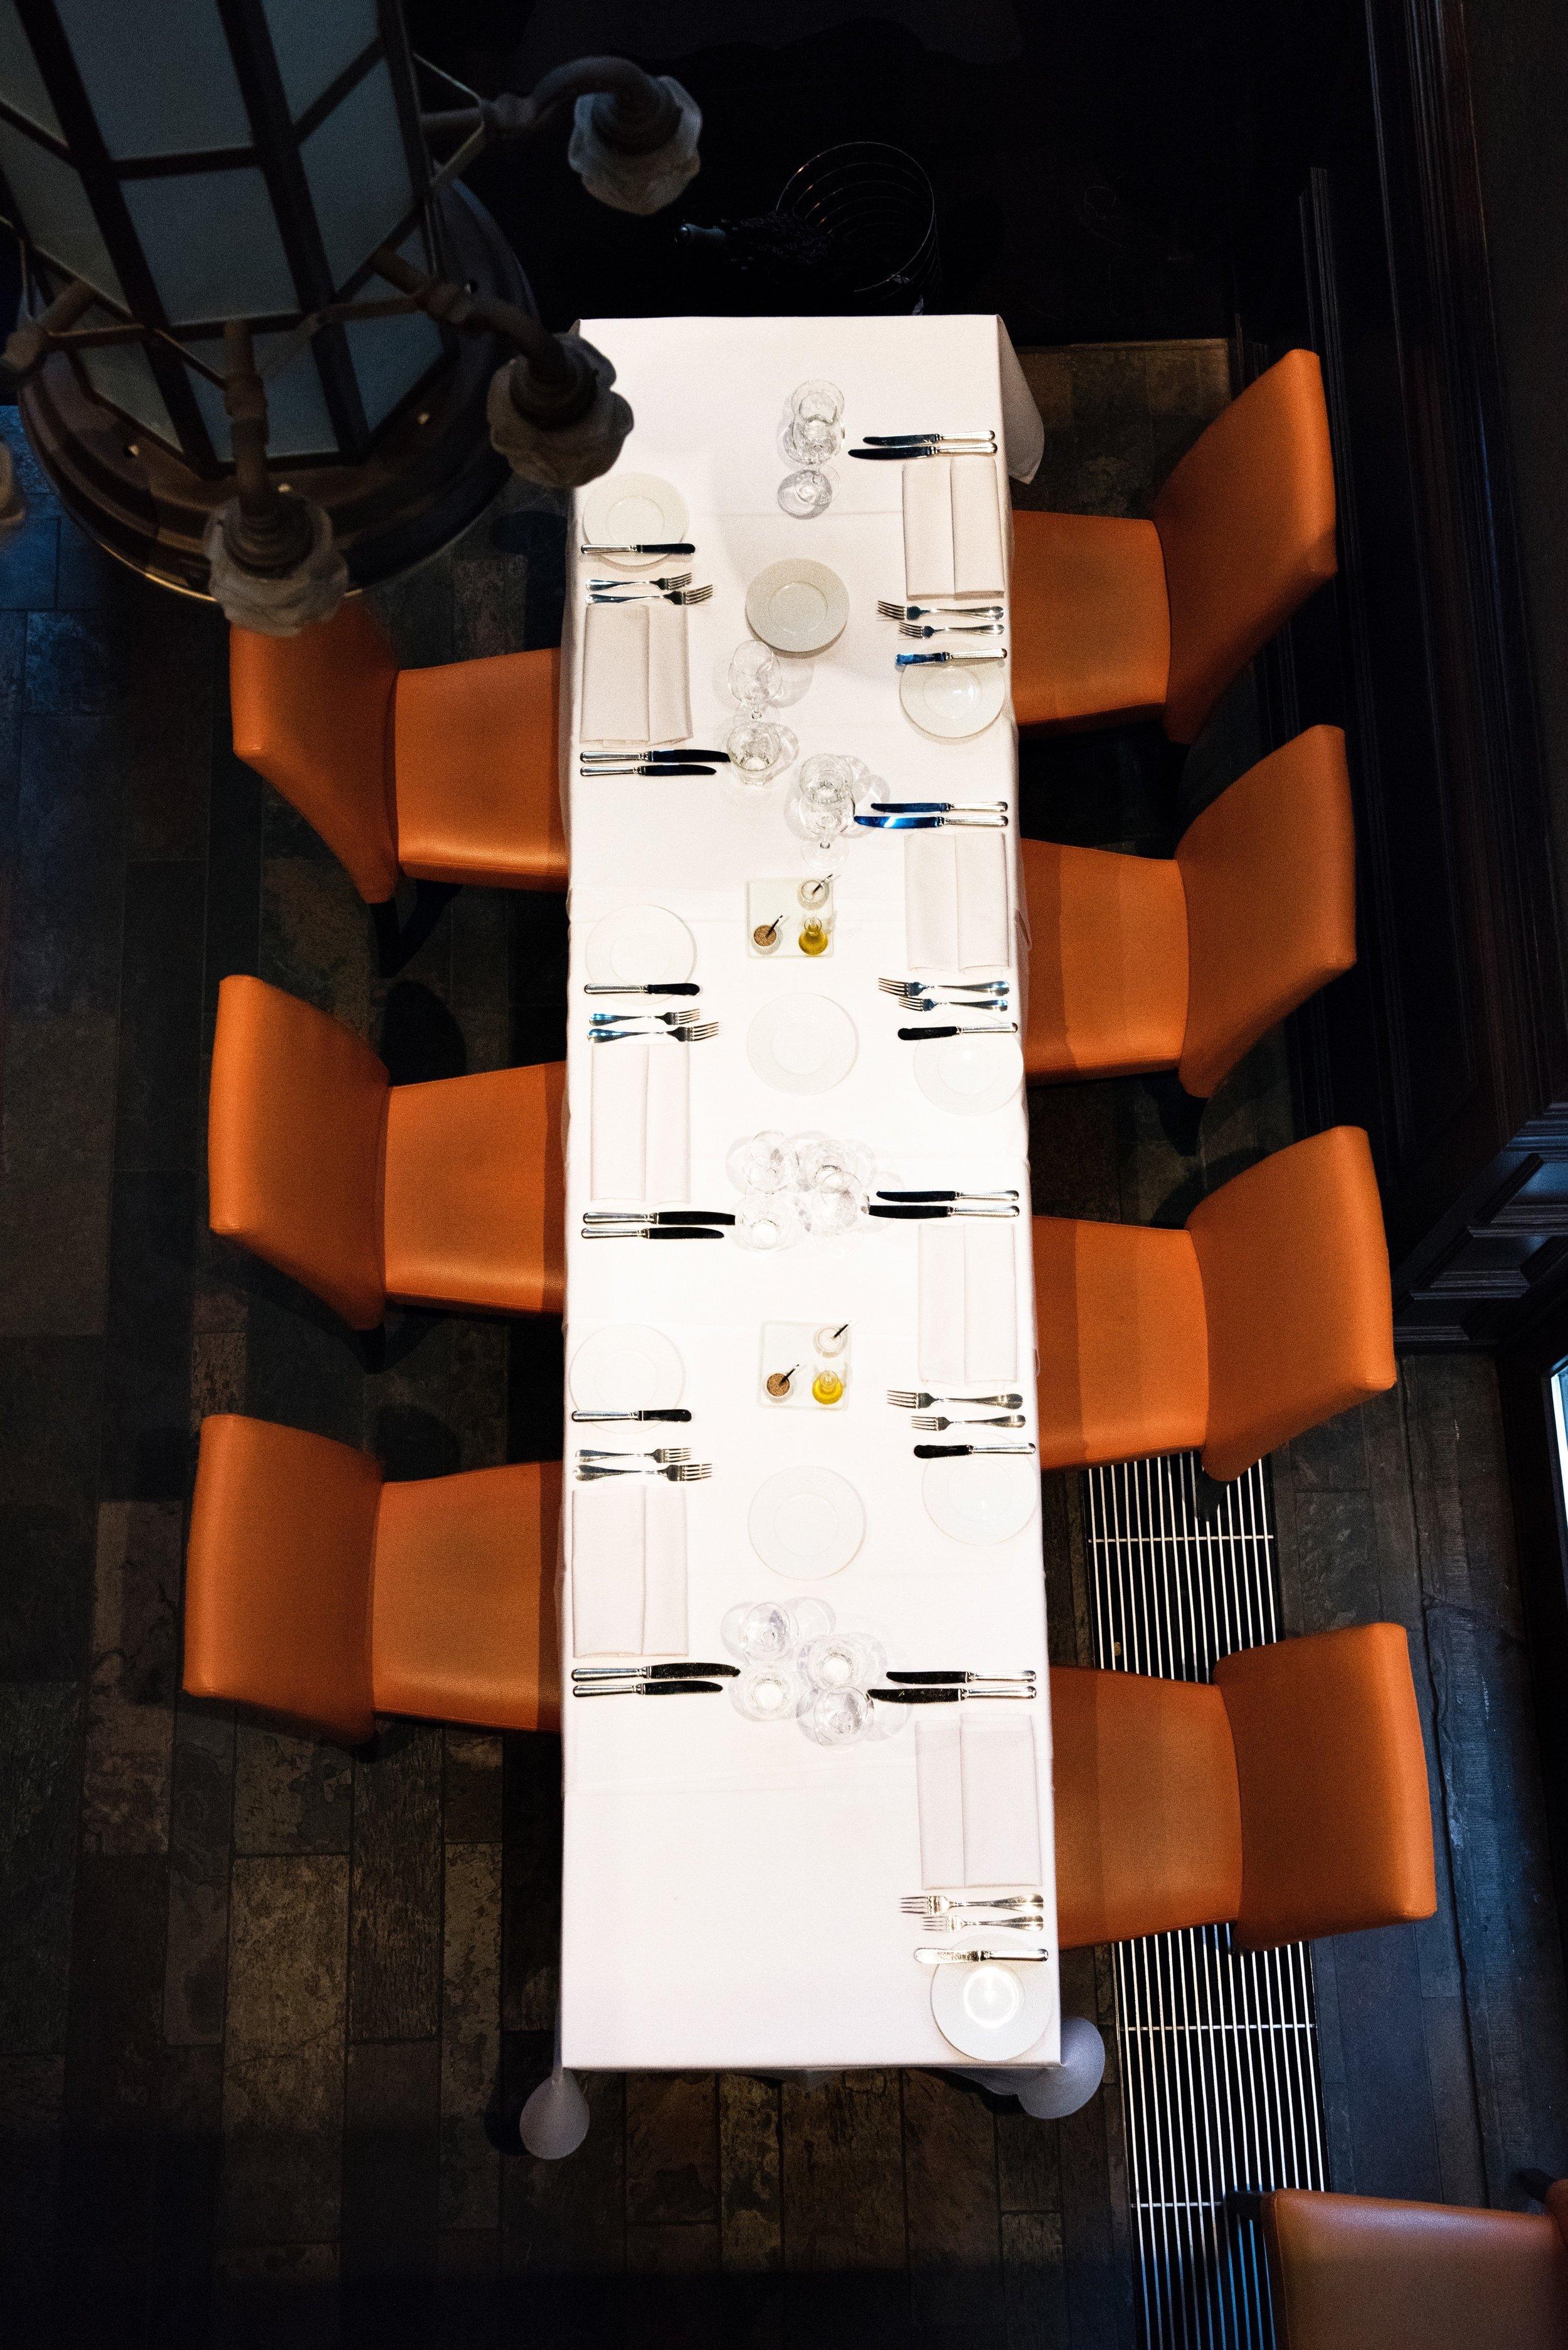 18 michelin restaurant the glorious antwerpen tablefever bart albrecht.jpg